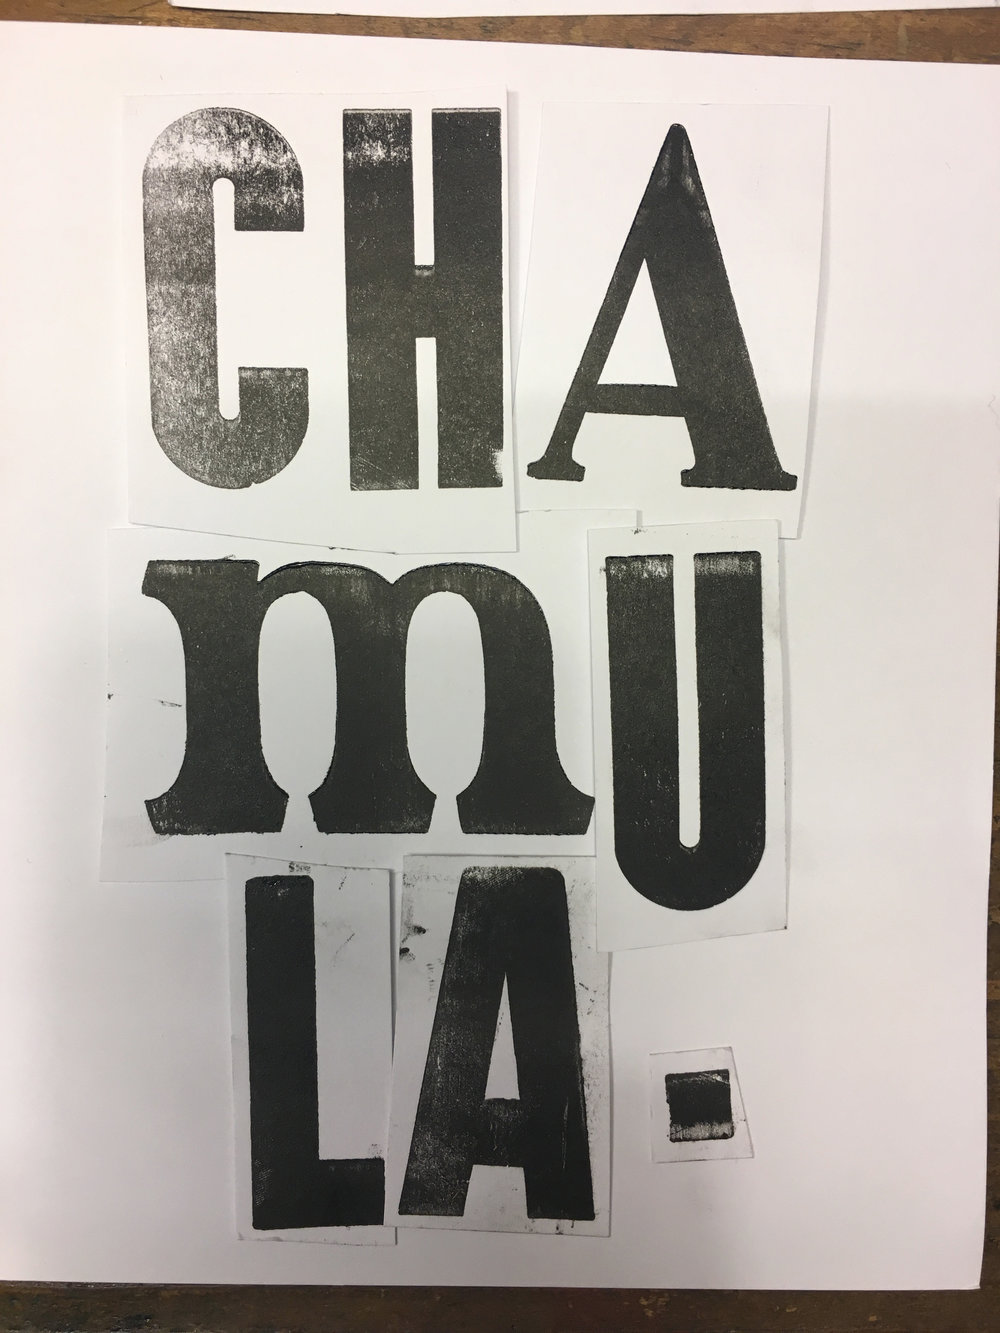 6-personalpress-taller-papel-principal-letterpress-imprenta-tipografica-1.jpg